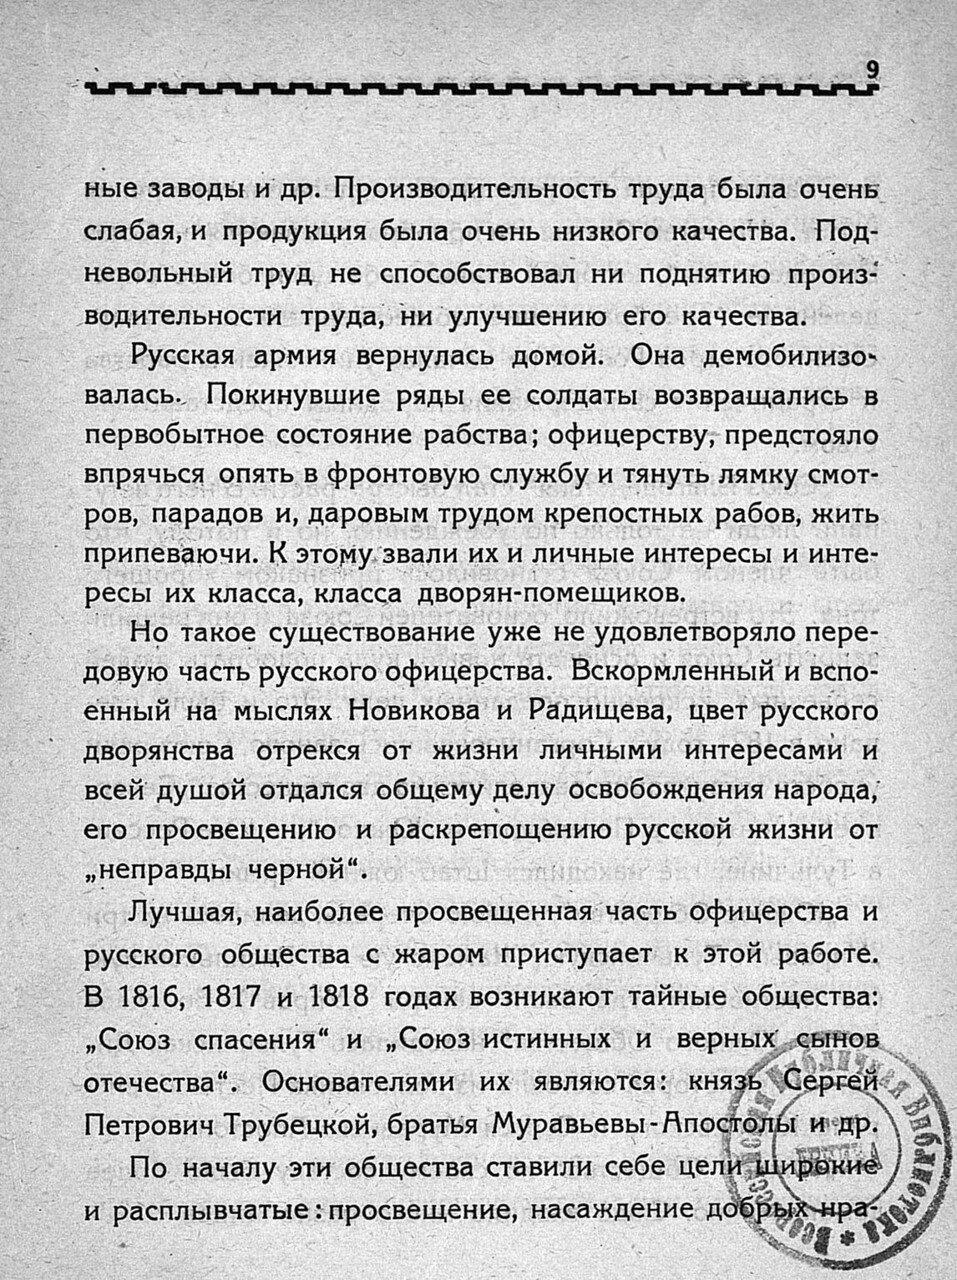 https://img-fotki.yandex.ru/get/38765/199368979.23/0_1bfacd_4785892f_XXXL.jpg